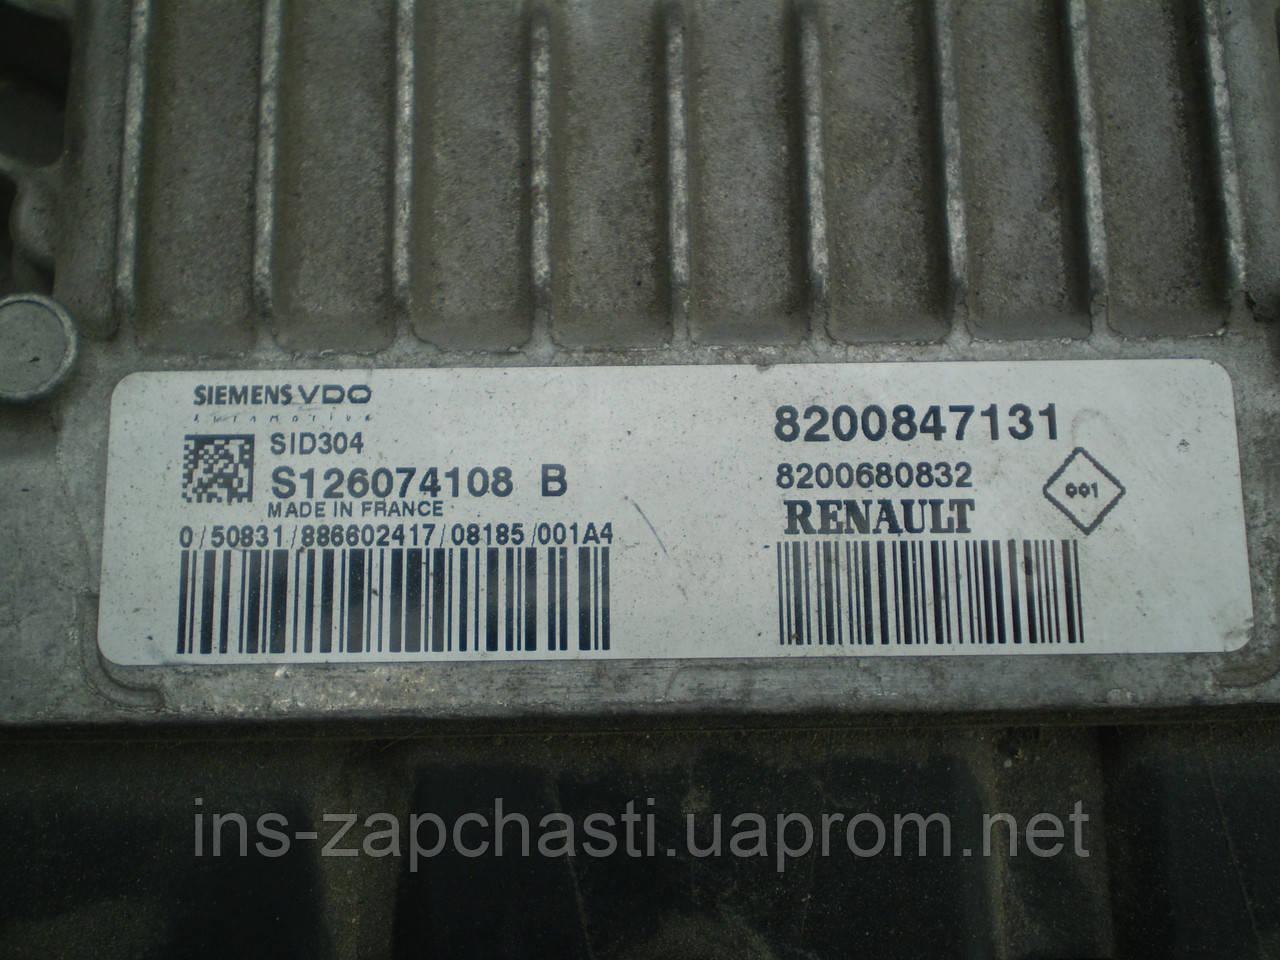 ЭЛ БЛОК ВПРЫСКА ТОПЛИВА ДВС Renault 8200847131